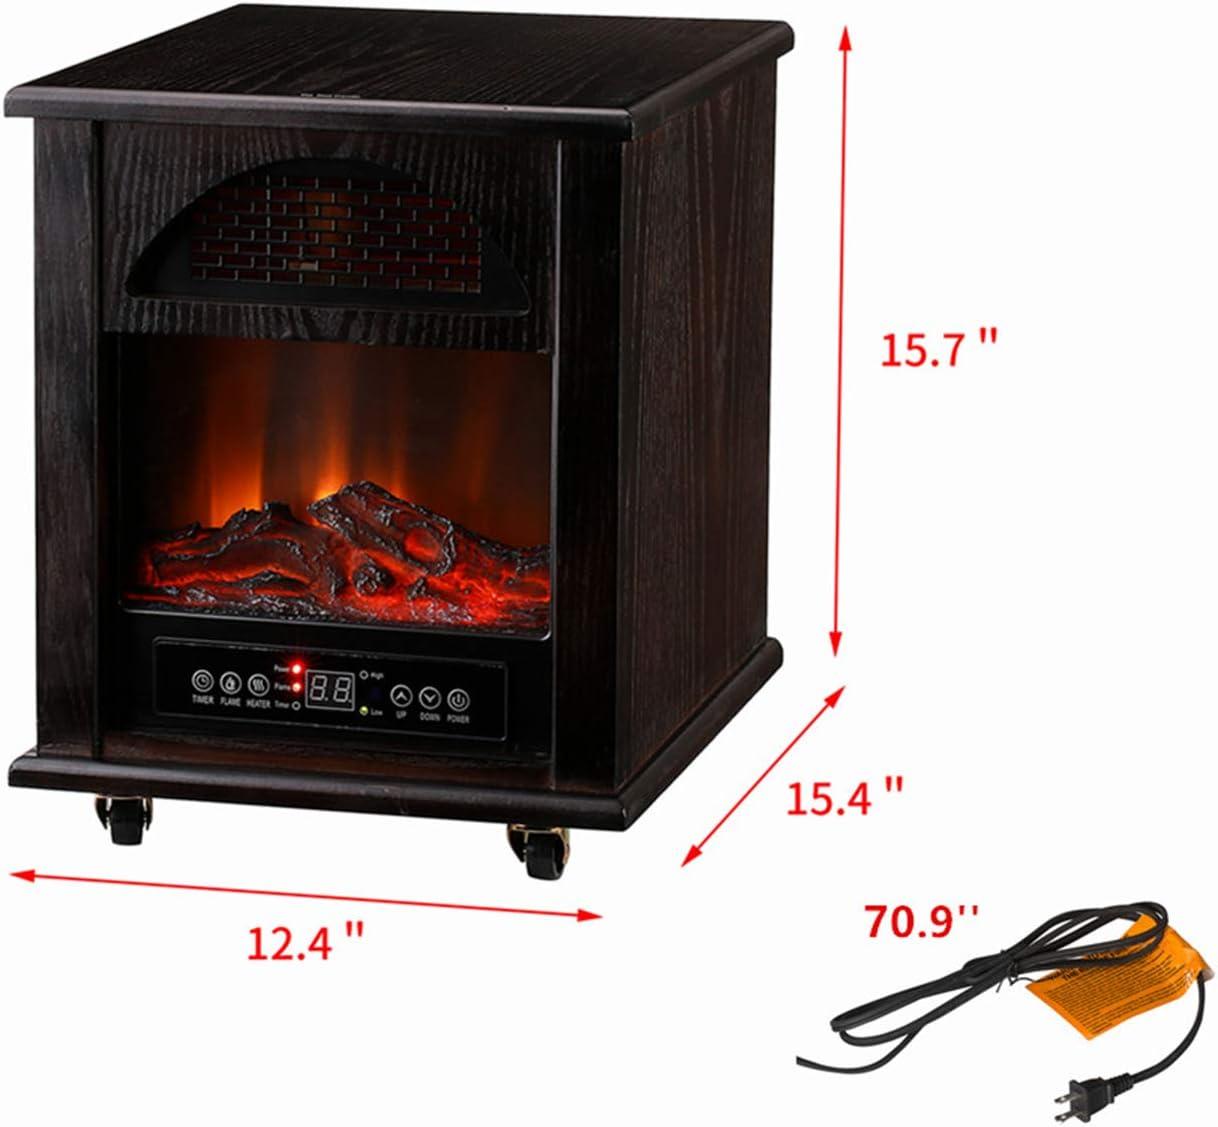 KOOLWOOM Portable Electrci Space Heater Infrared Zone Heating ...